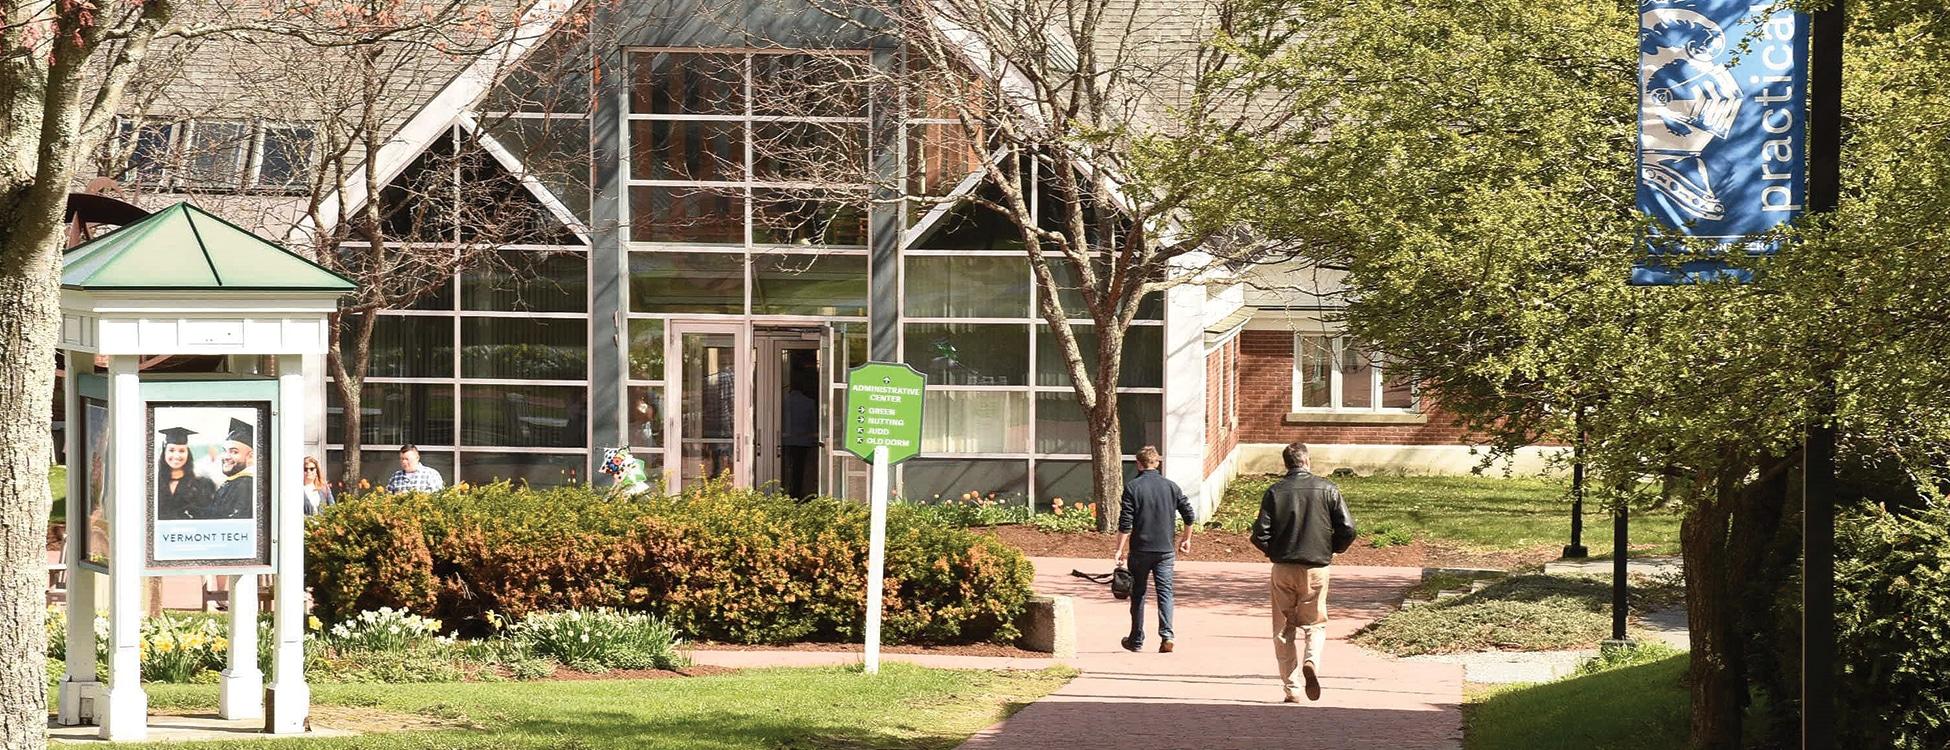 Students walk toward Administrative Building on Randolph Center campus